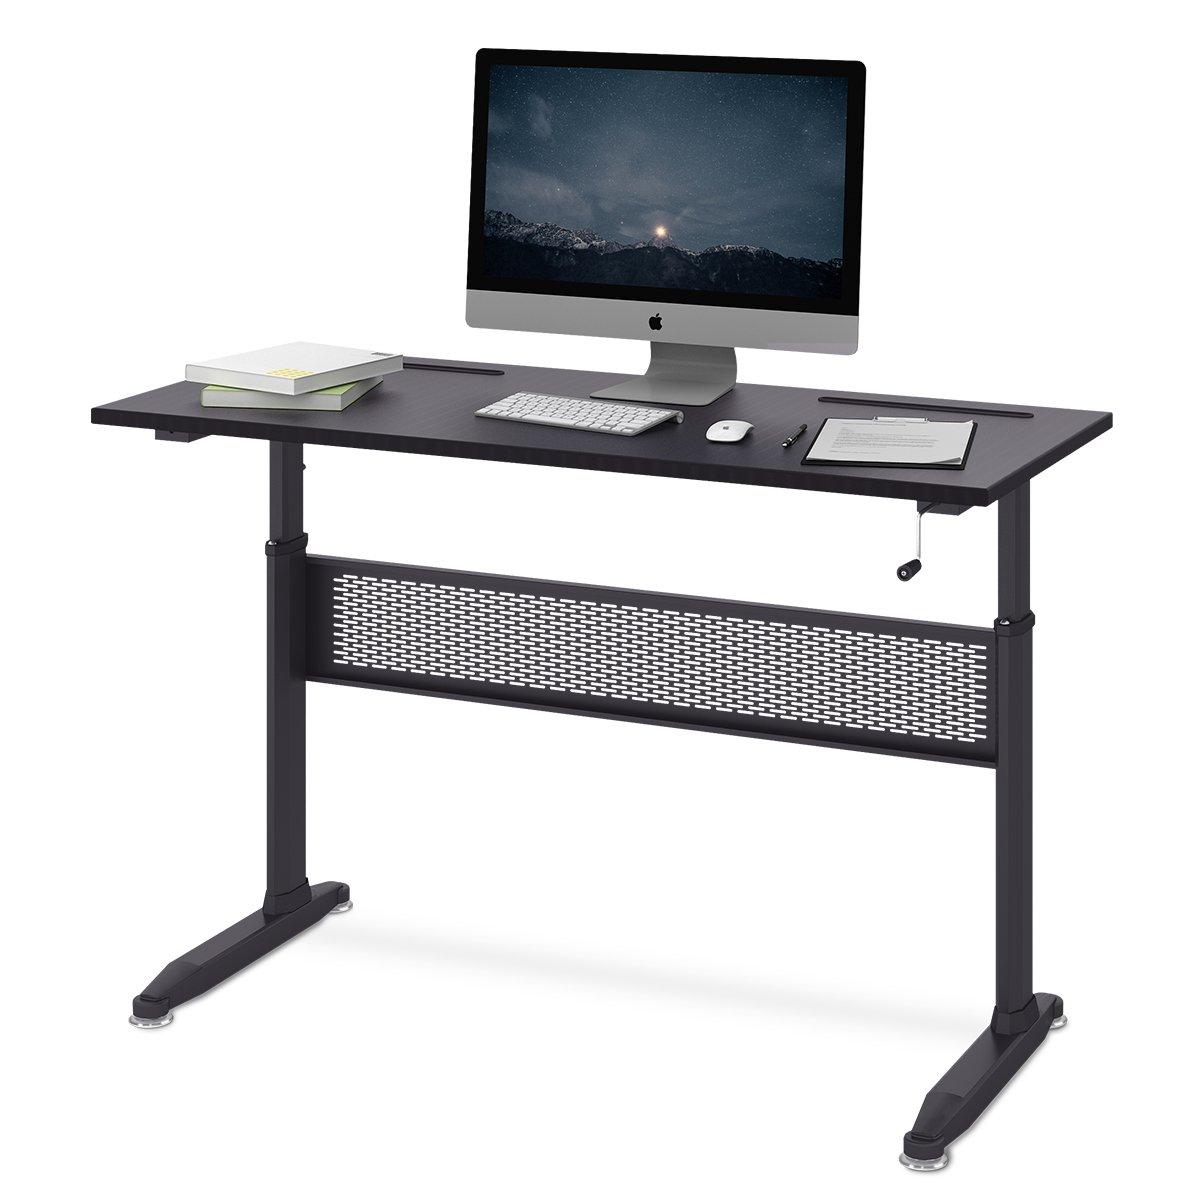 DEVAISE Adjustable Height Standing Desk 55 Inch with Front Crank Handle / Black